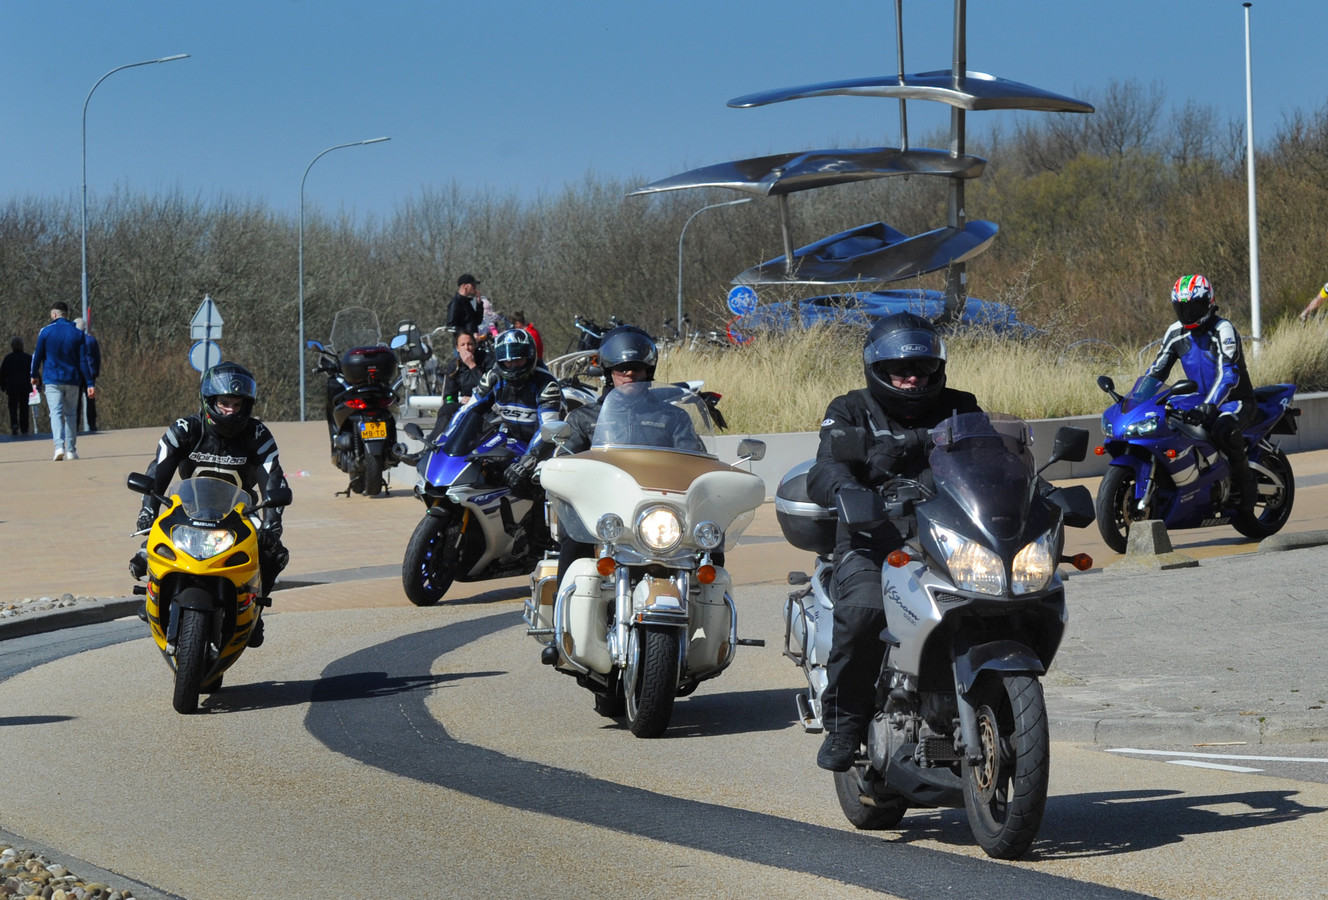 Groepjes motorrijders  op de Vlissingse boulevard afgelopen weekeinde.